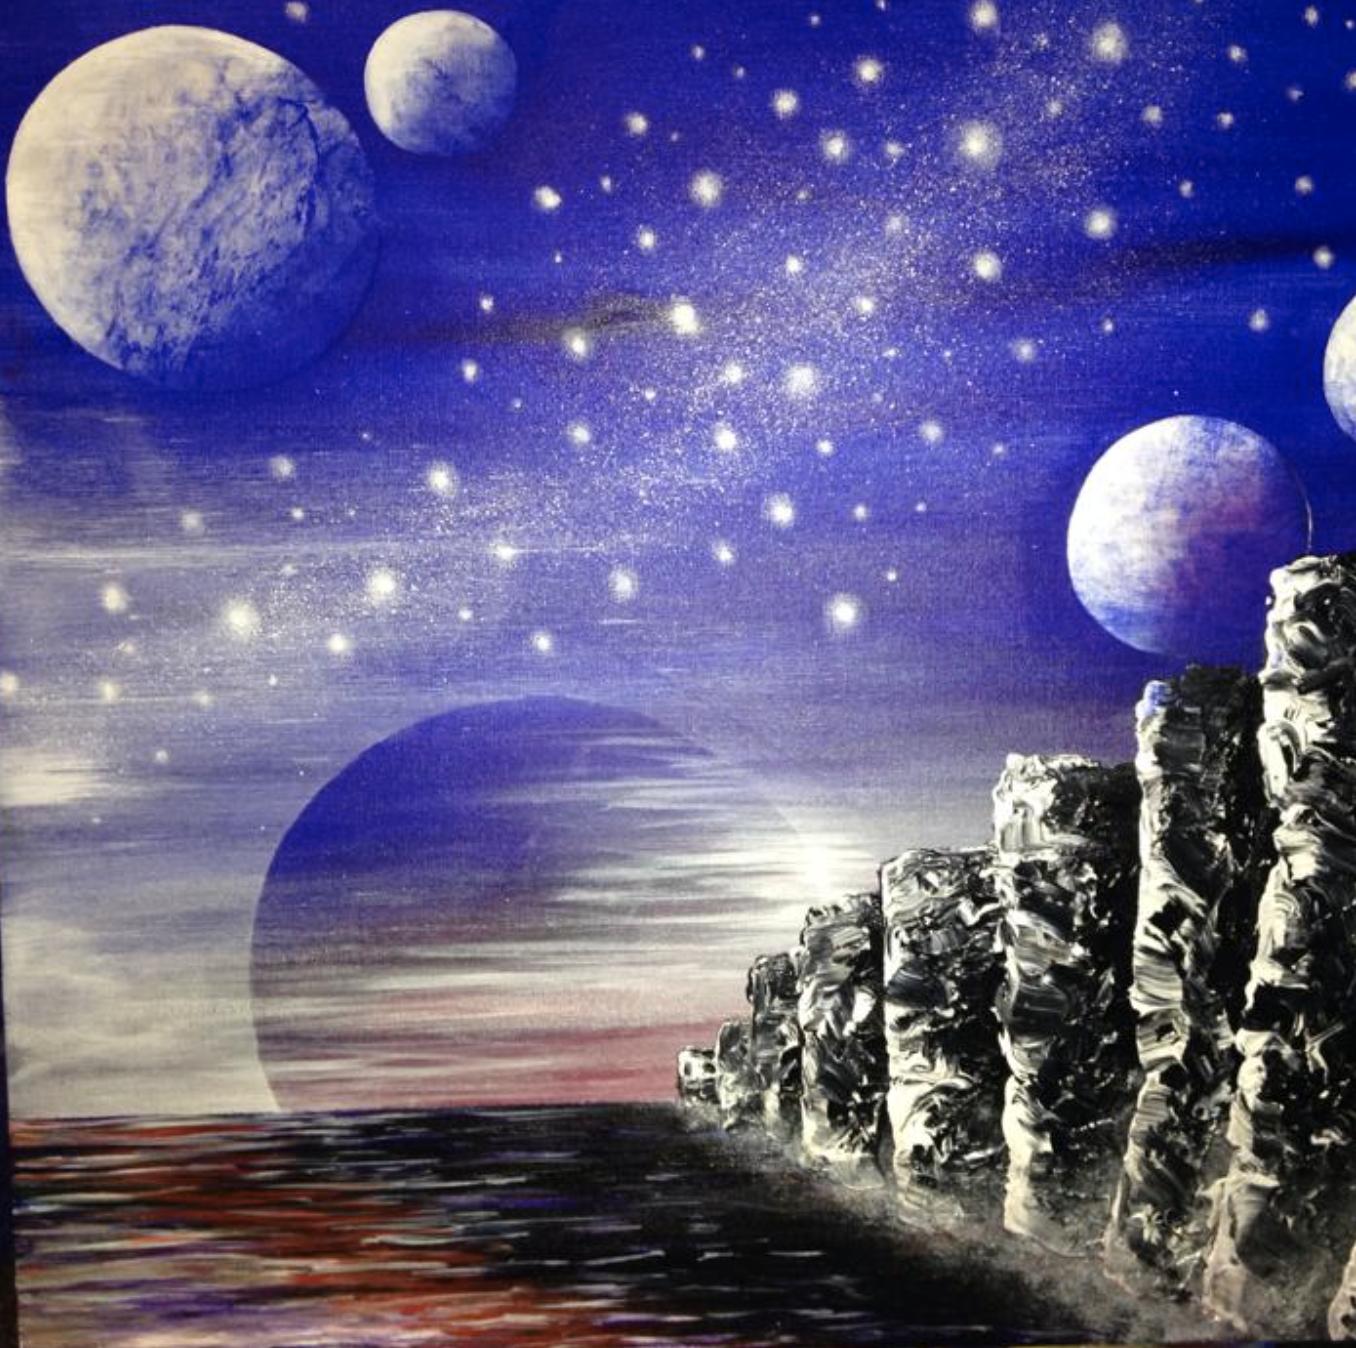 Acrylic Galaxy Artwork - Intermediate level - Tues 2nd Oct - 12-4pm SH010